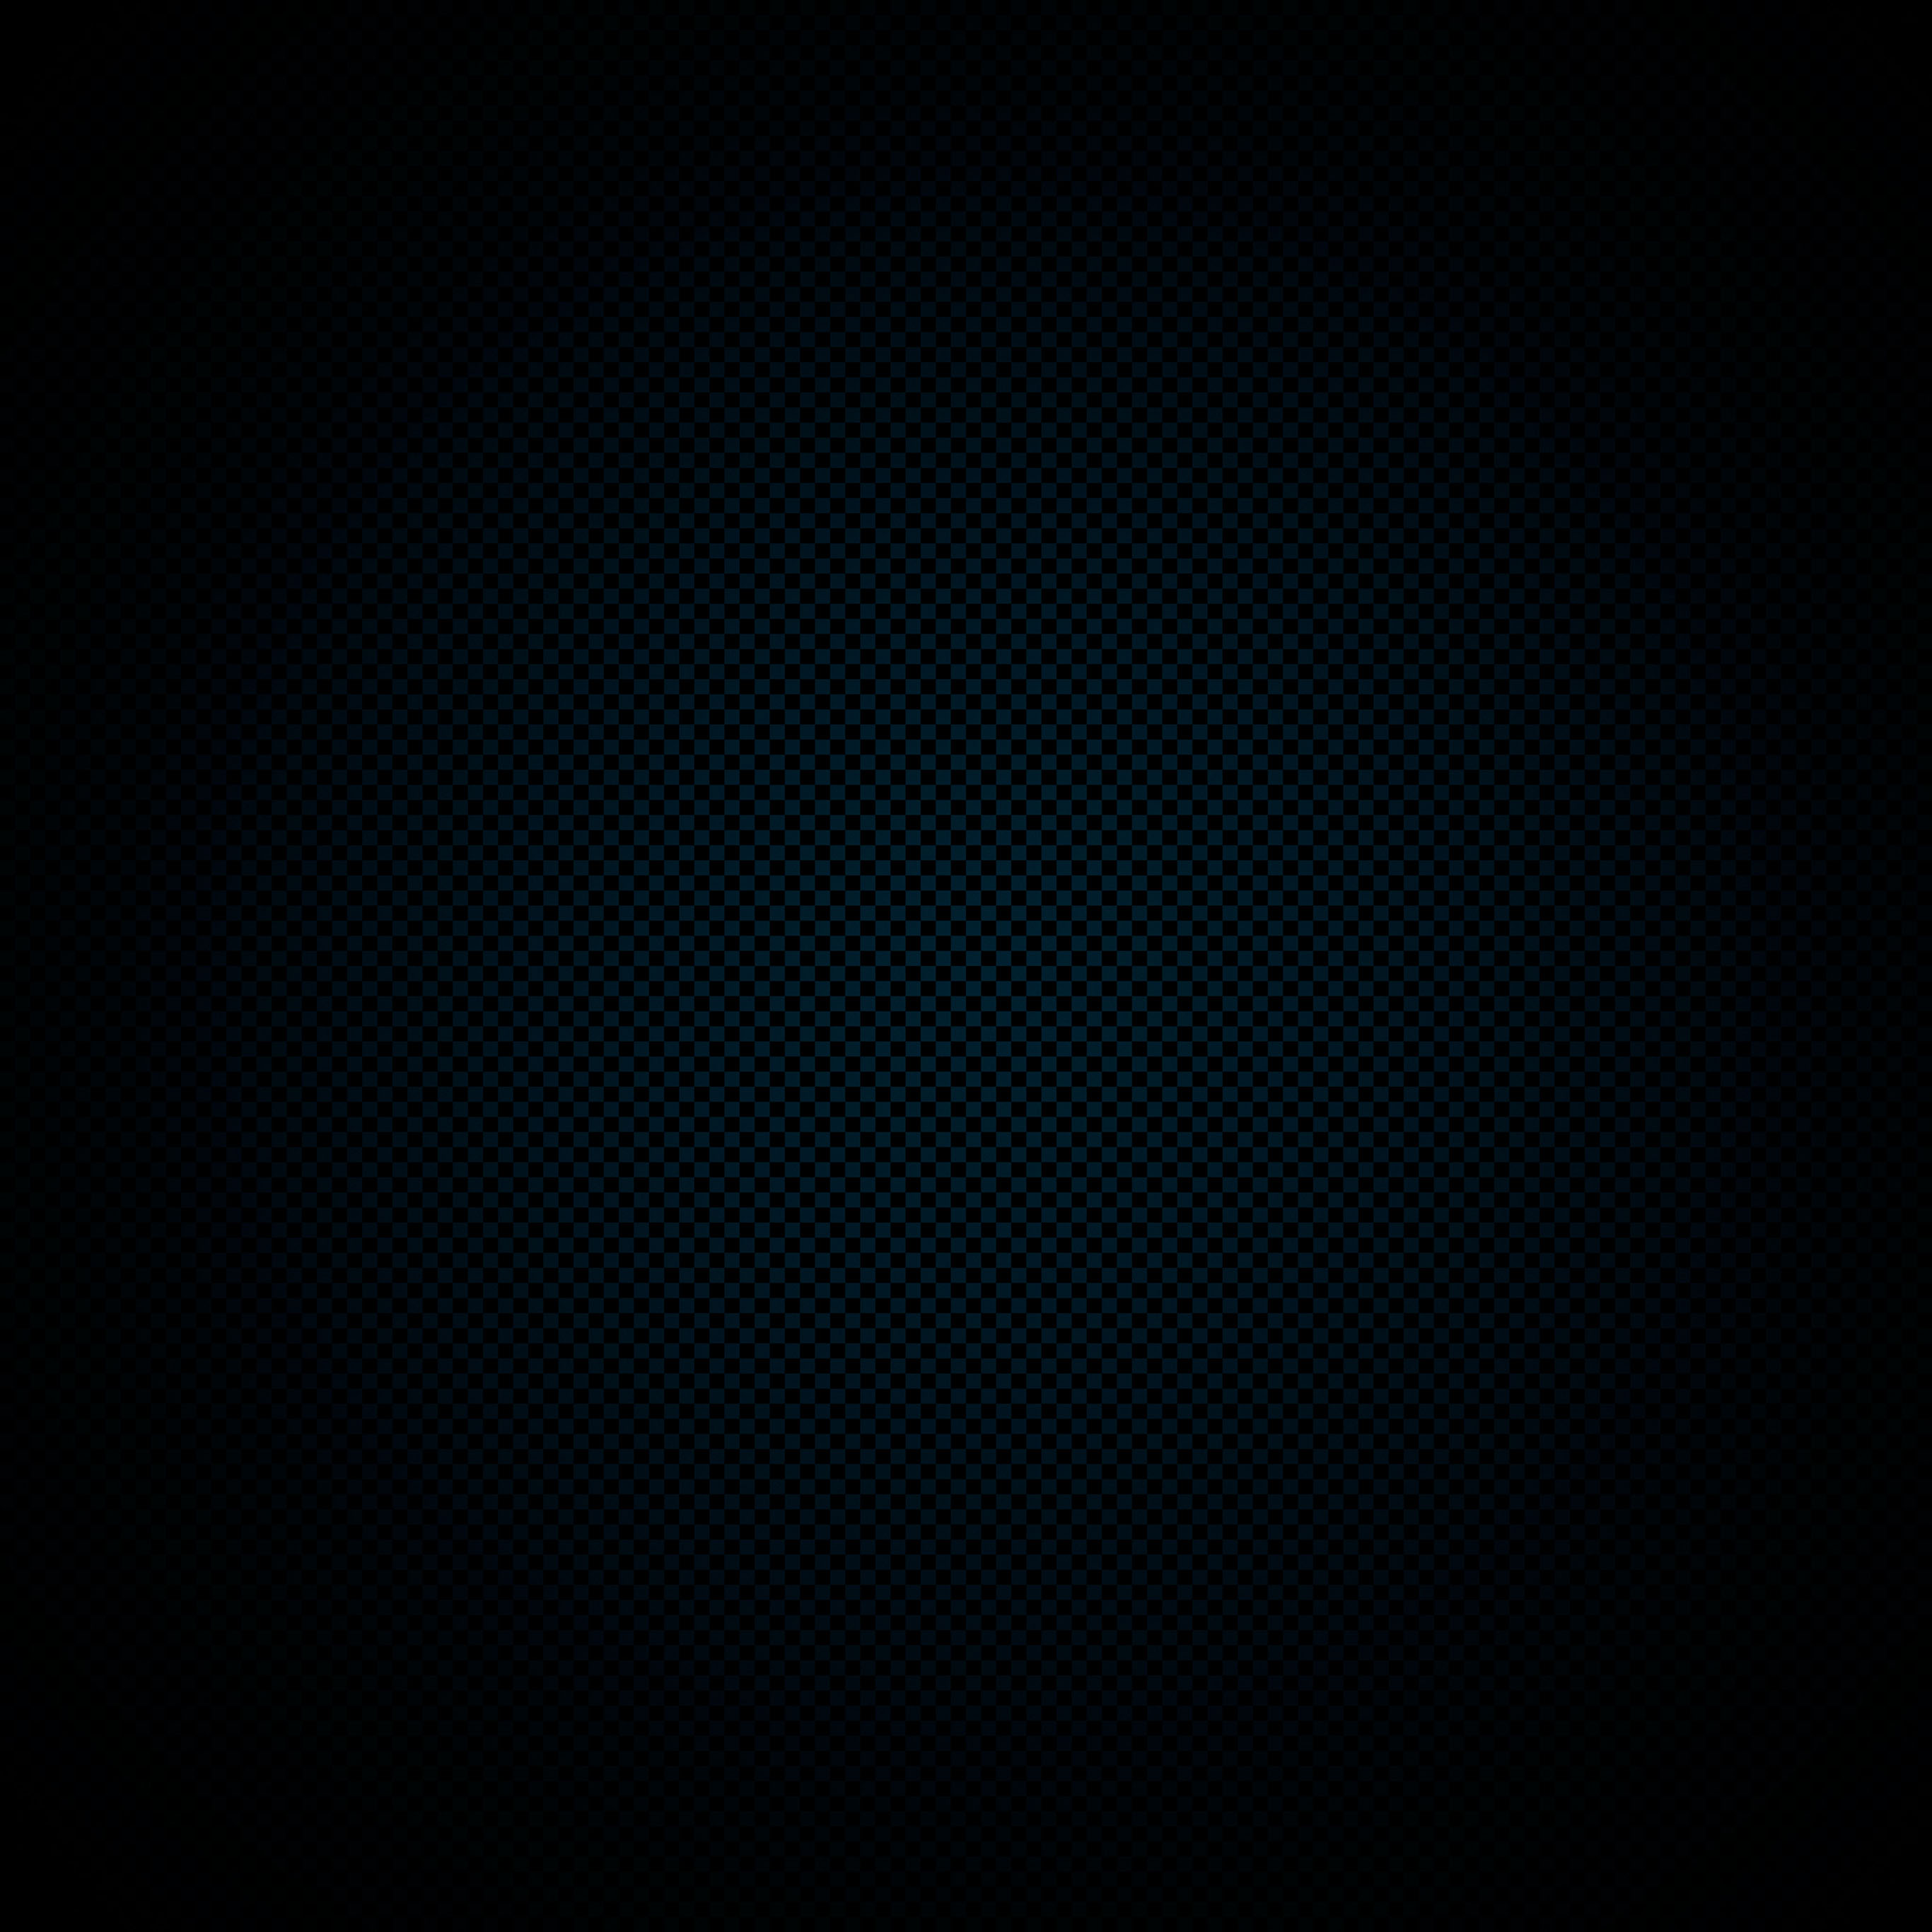 Black Wallpapers 8835   HDWPro 2732x2732